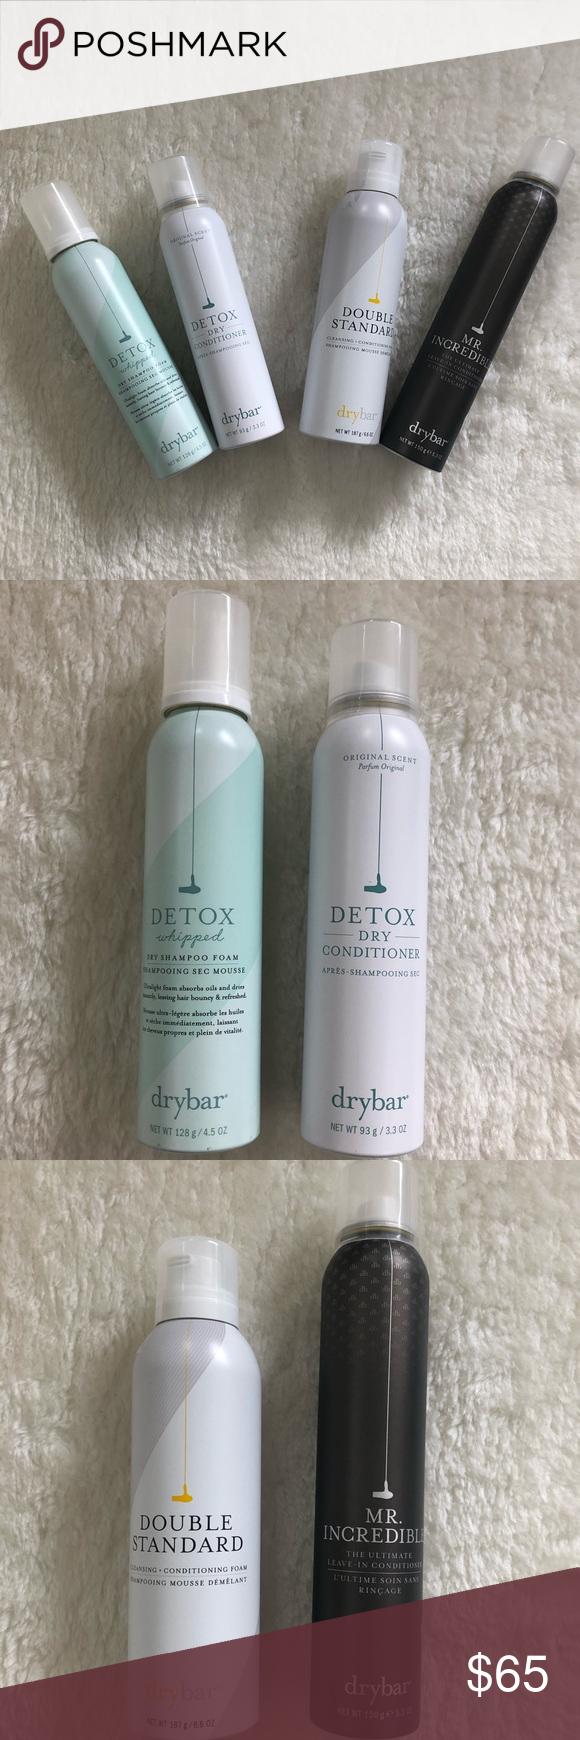 Drybar Bundle Drybar Dry Conditioner Dry Shampoo